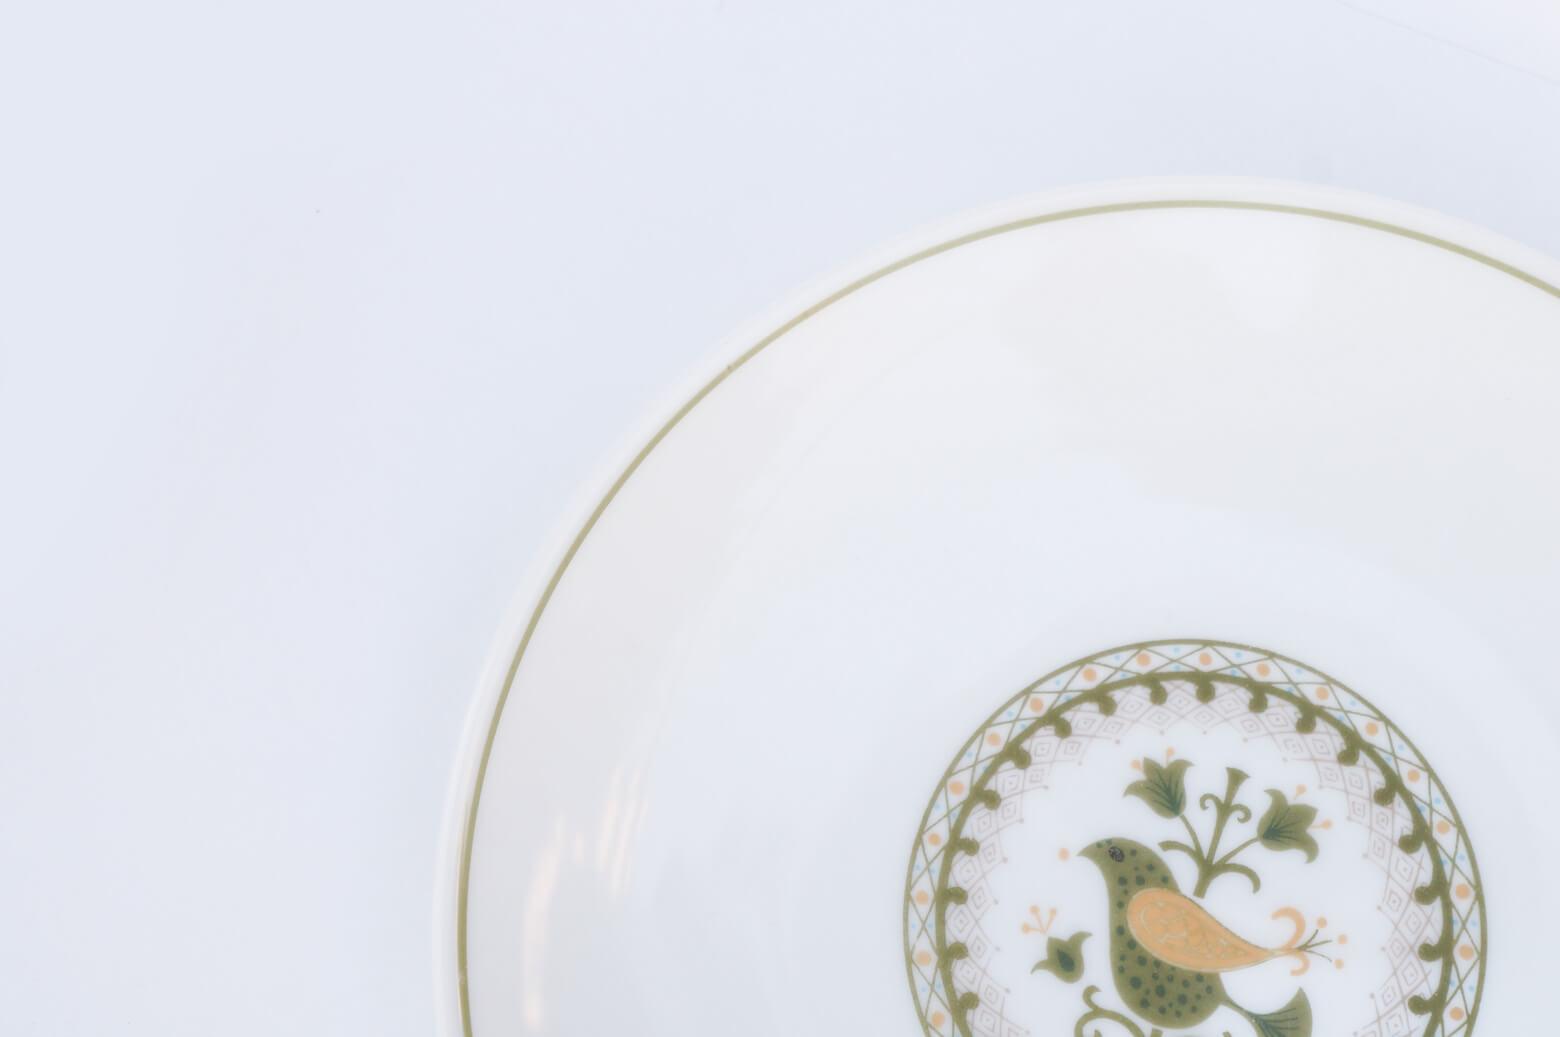 Vintage Noritake Cake Plate Hermitage U.S. Pattern Tableware/ノリタケ ケーキ プレート エルミタージュ テーブルウェア レトロ ヴィンテージ食器 4